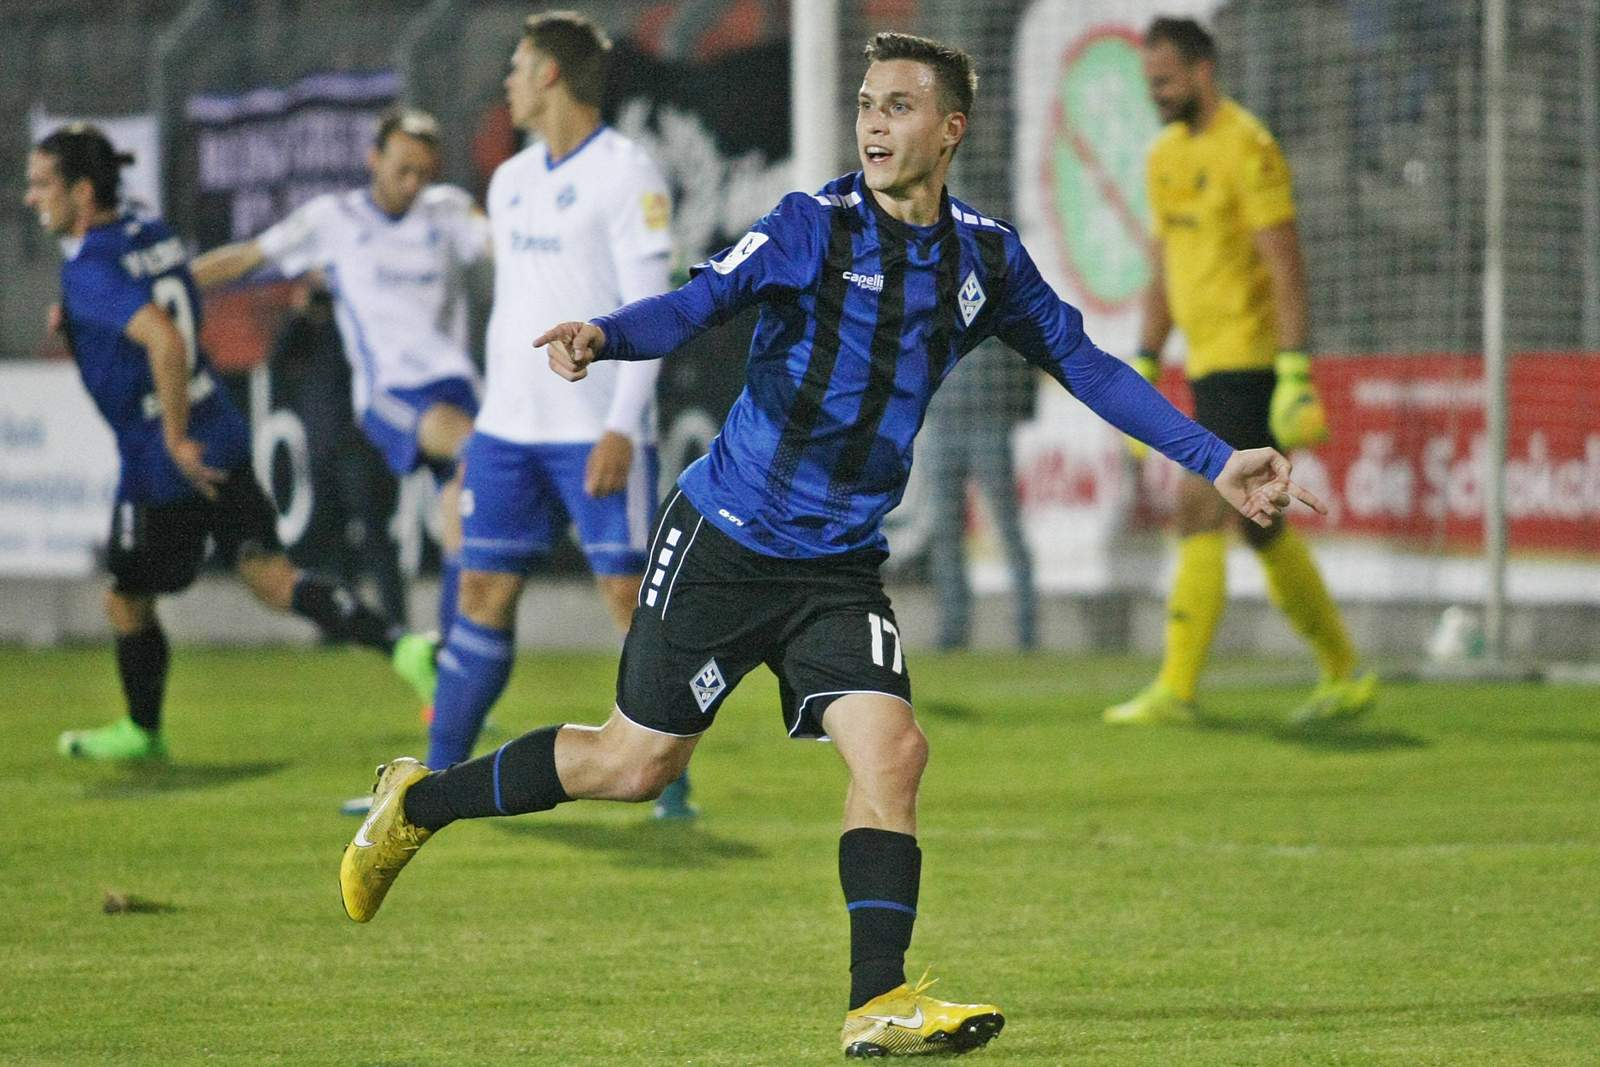 Gianluca Korte bejubelt seinen Treffer gegen Pirmasens.